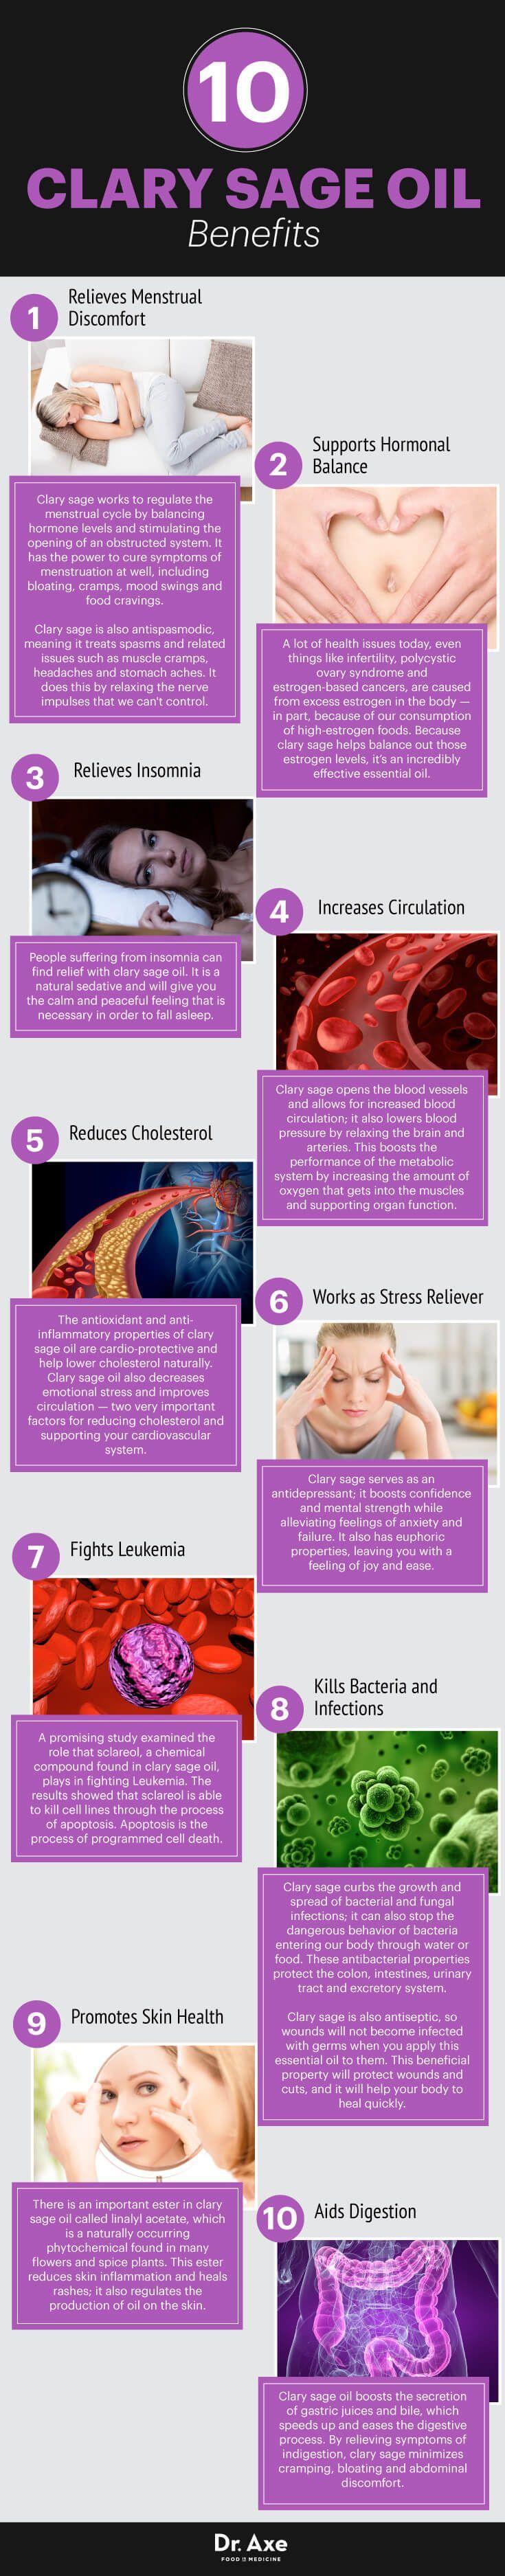 Clary Sage Oil Helps Hormone Balance & Menstrual Pain - Dr. Axe